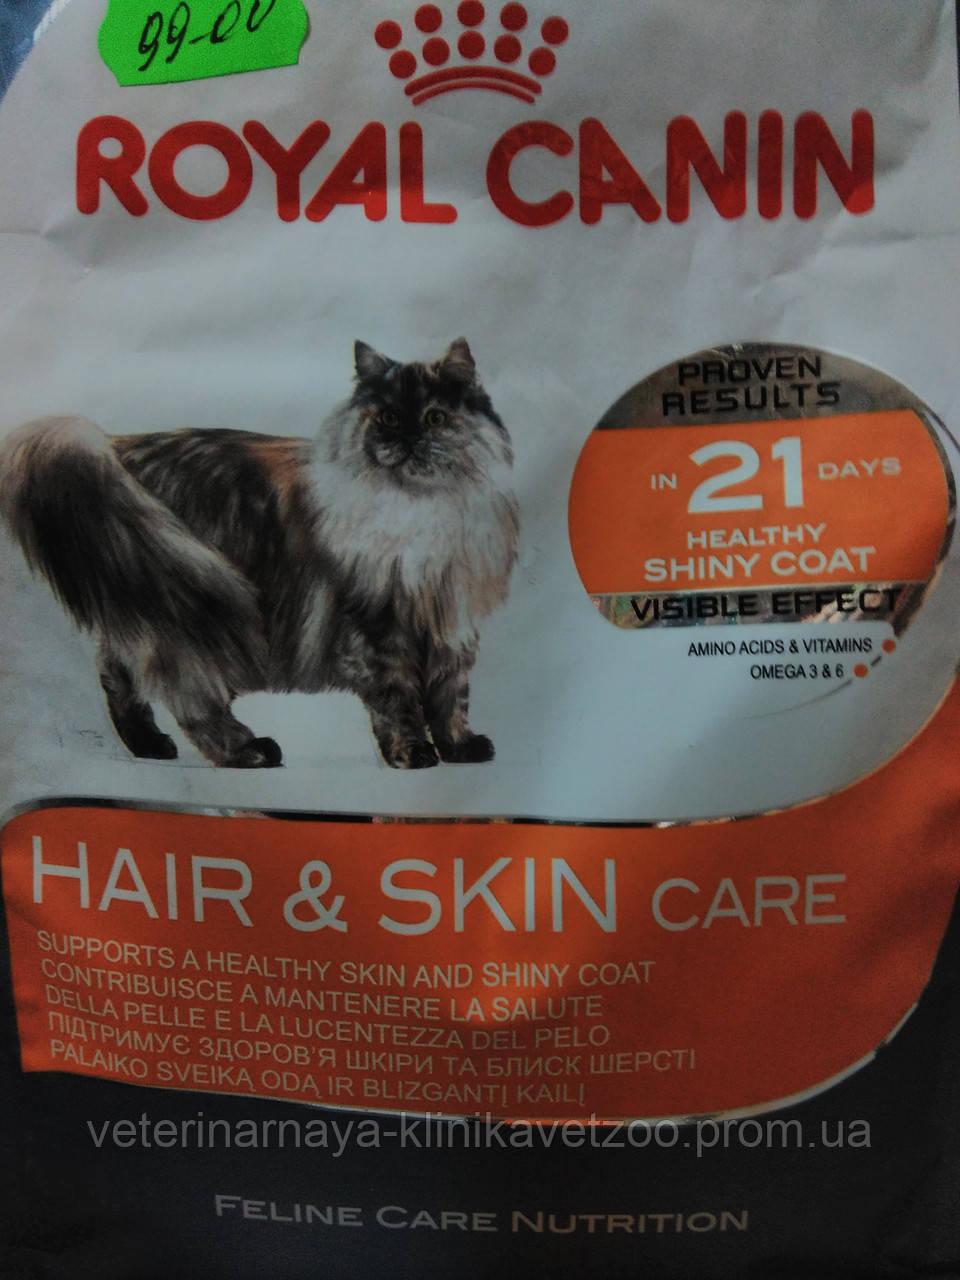 Royal Canin(hair & skin) корм для взрослых кошек (здоровая кожа и шерсть)от1 до 7ле400г,2кг,4кг,10кг.т